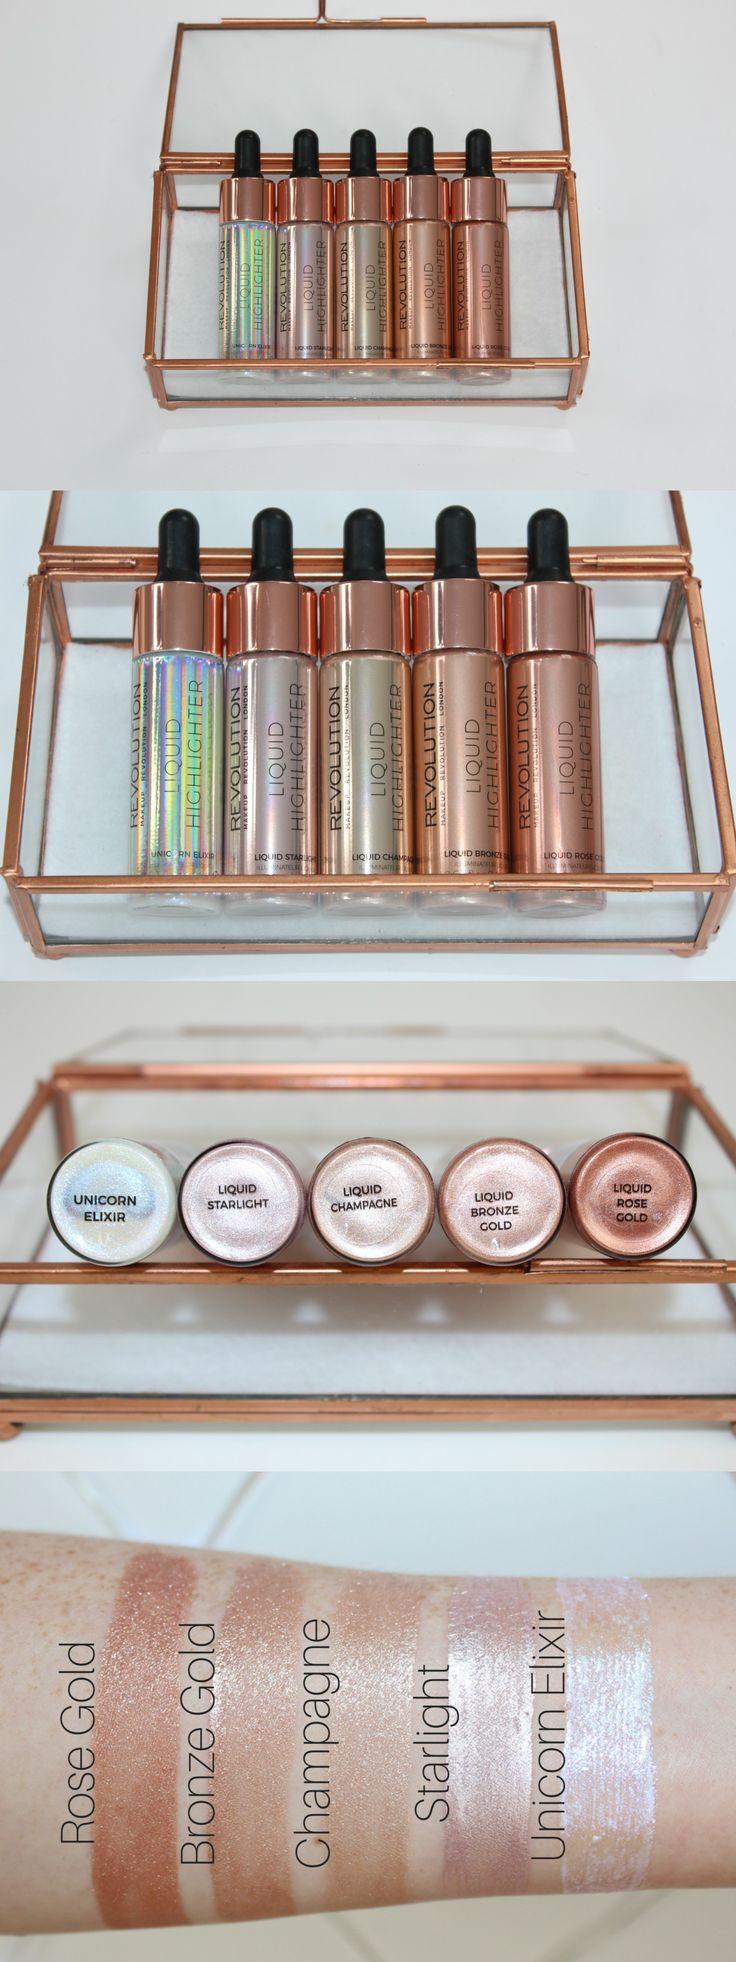 Makeup Revolution Liquid Highlighter Review & Swatches - Cover FX Custom Enhancer Drops Dupes